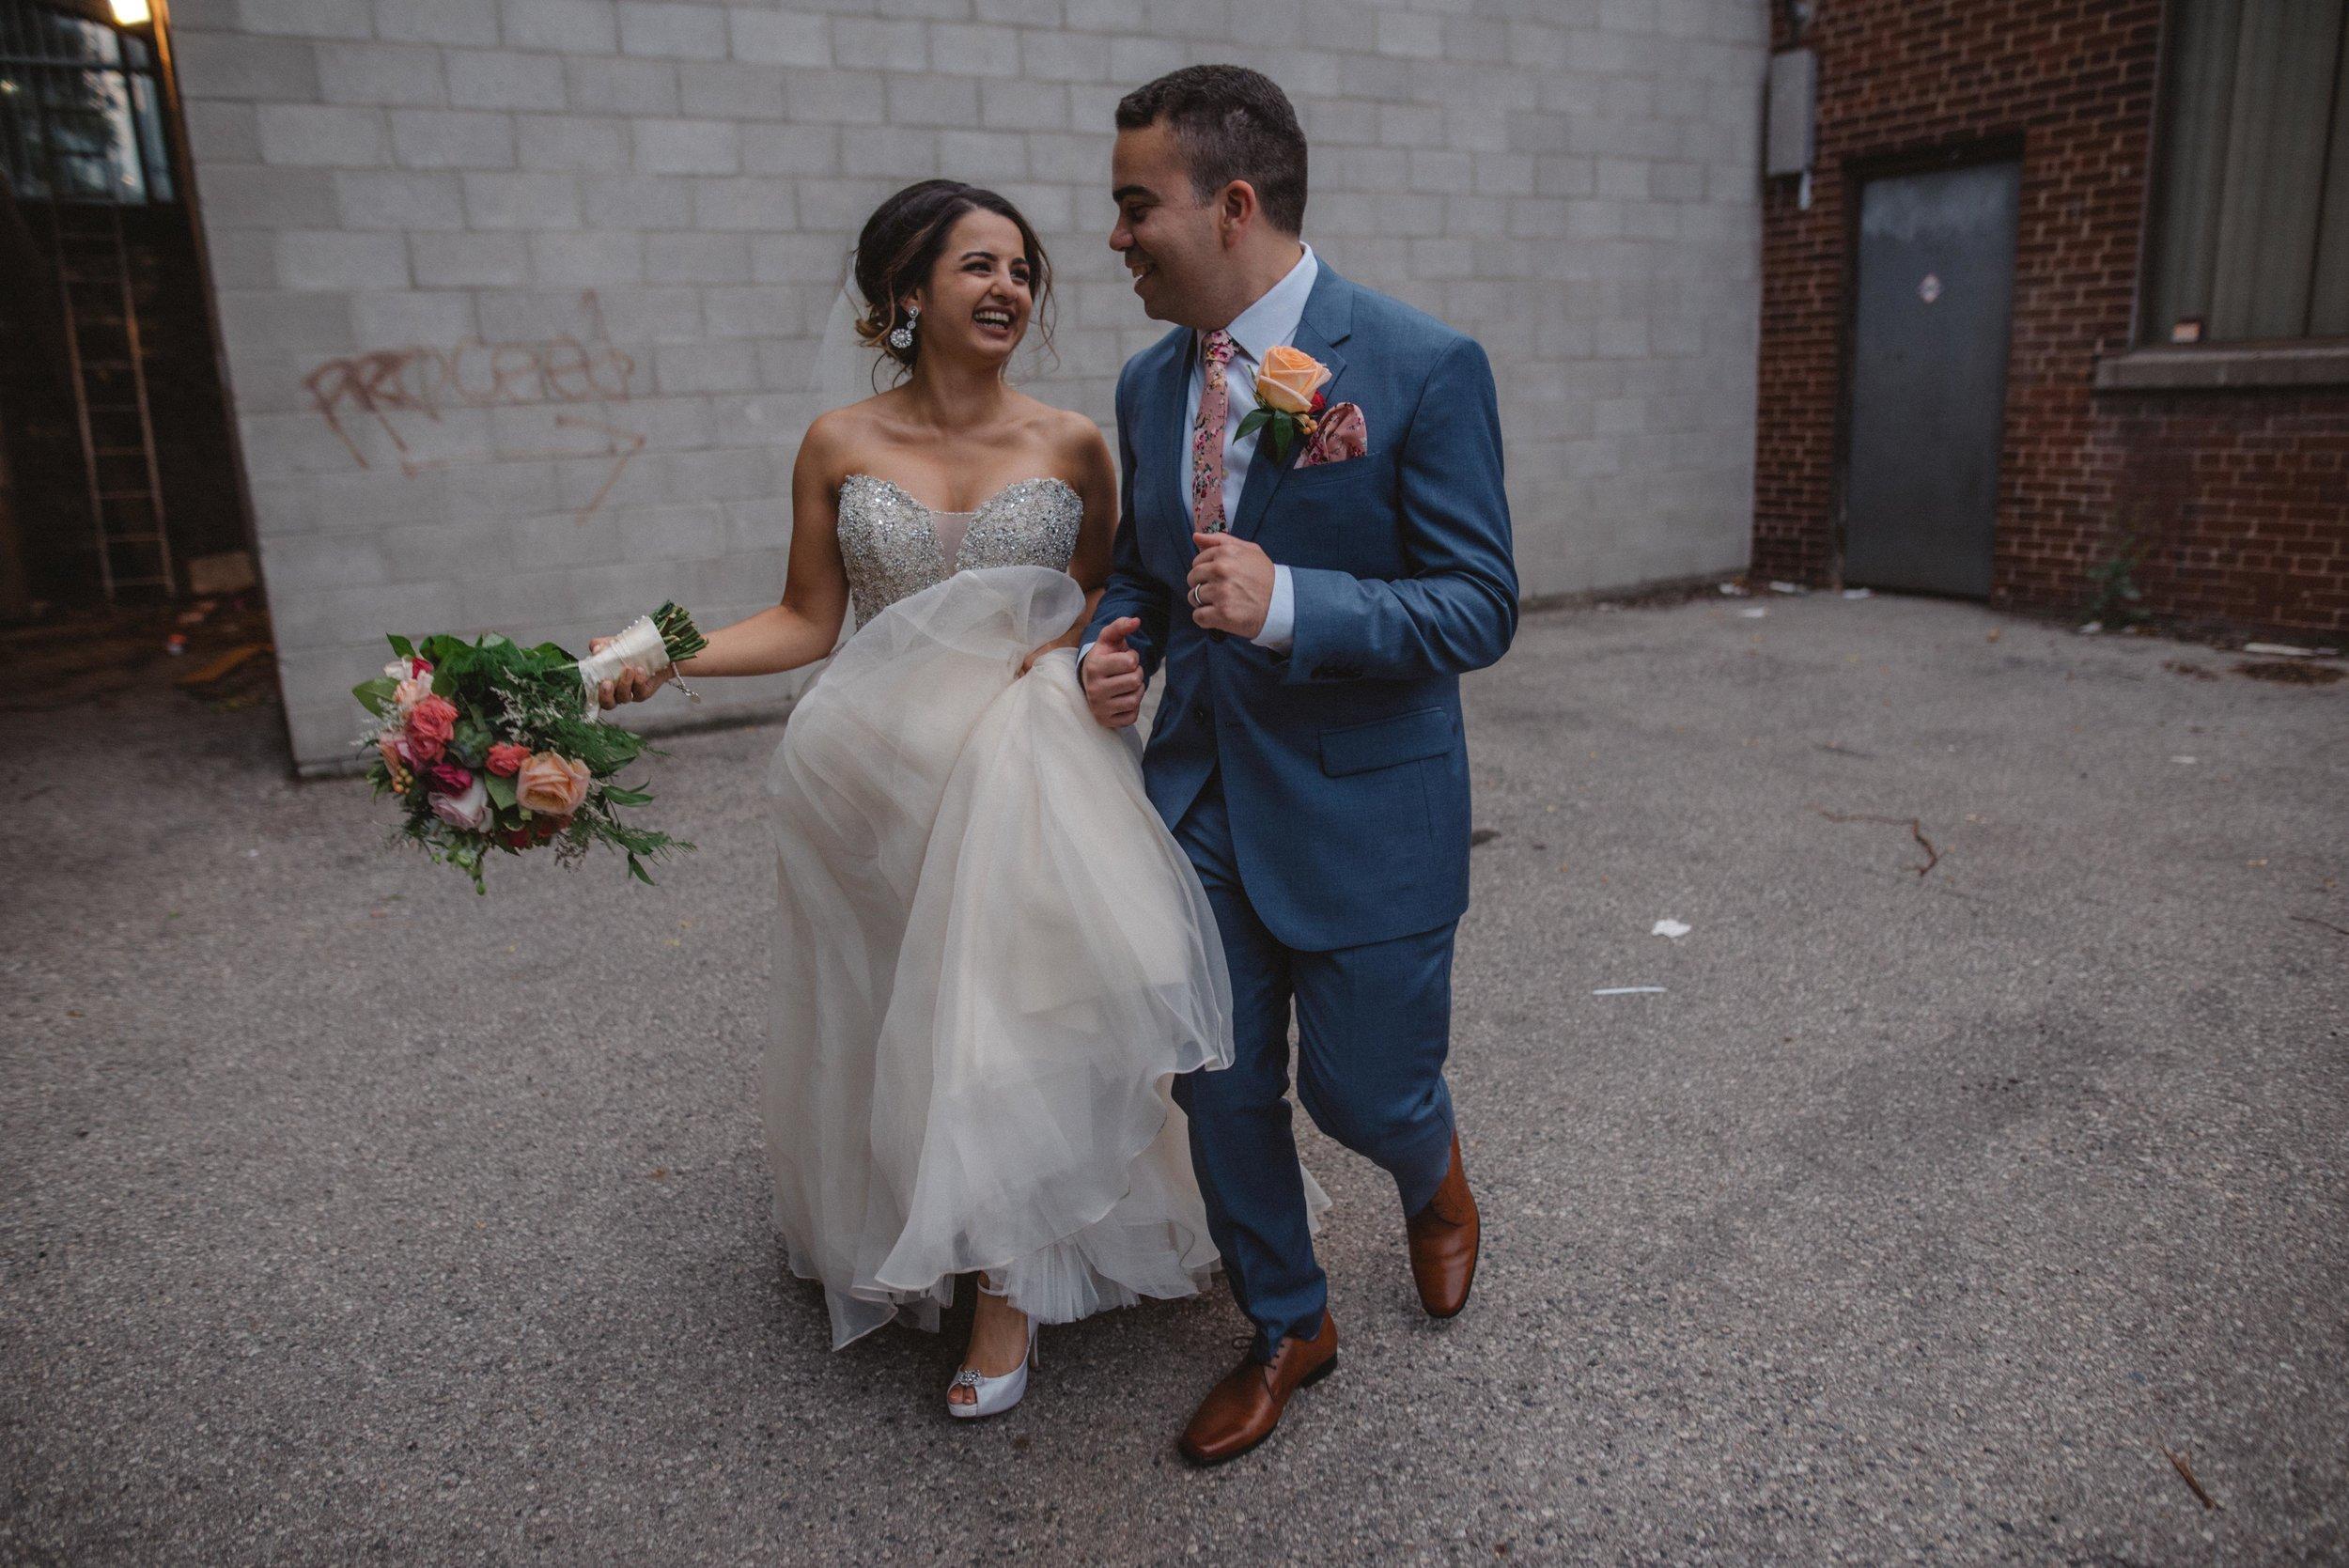 mariage_photographe_toronto_gatineau_ottawa_photographer_wedding-12.jpg